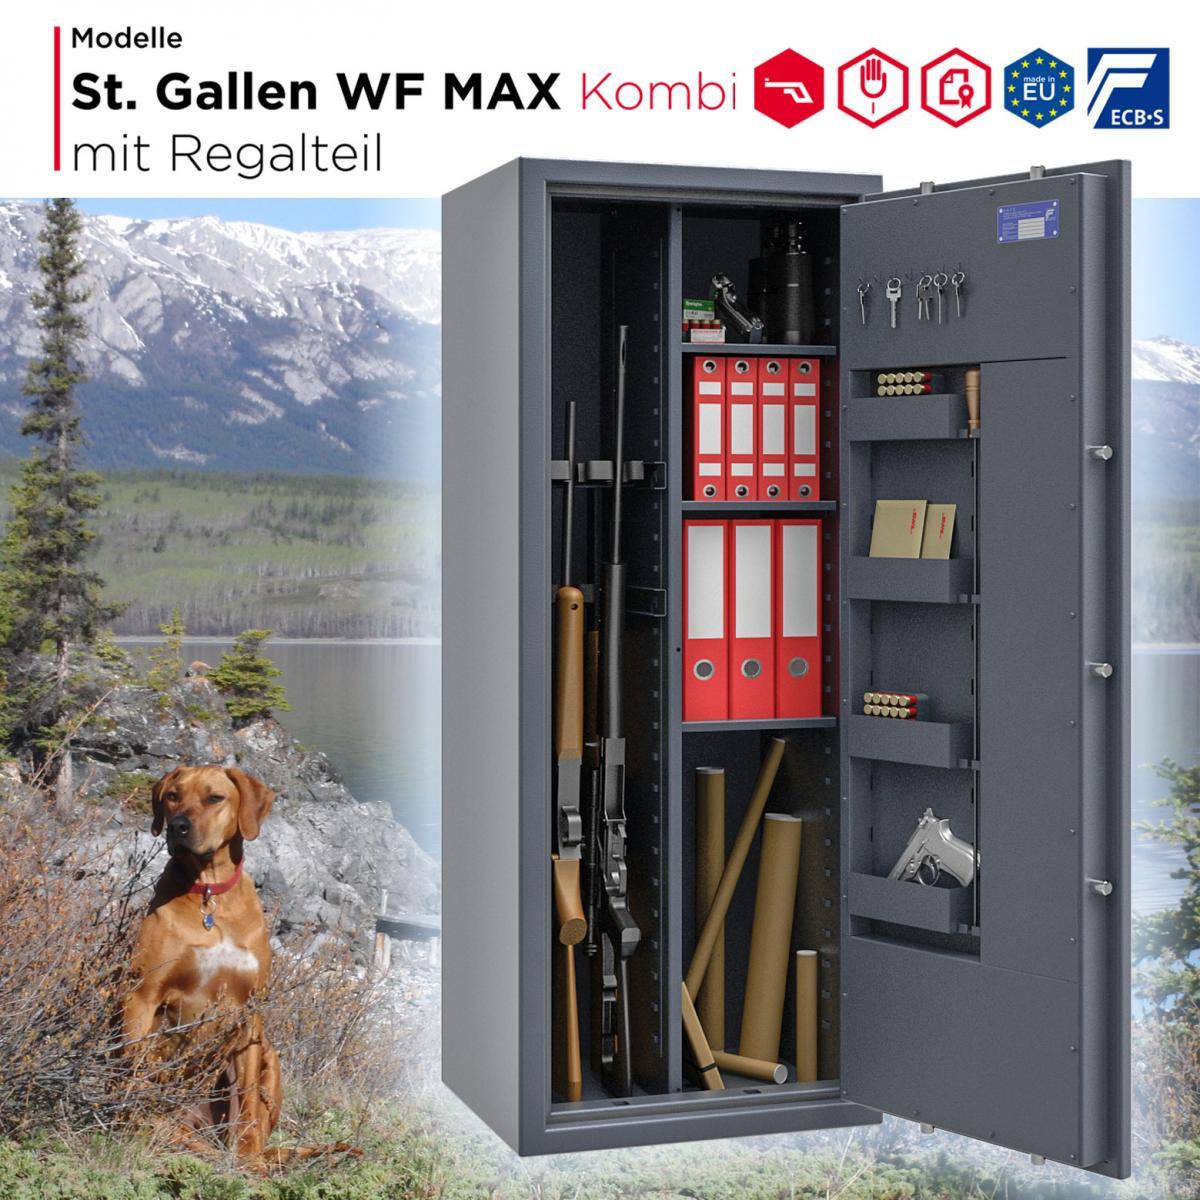 Konfigurator - Waffenschrank St. Gallen WF MAX Kombi